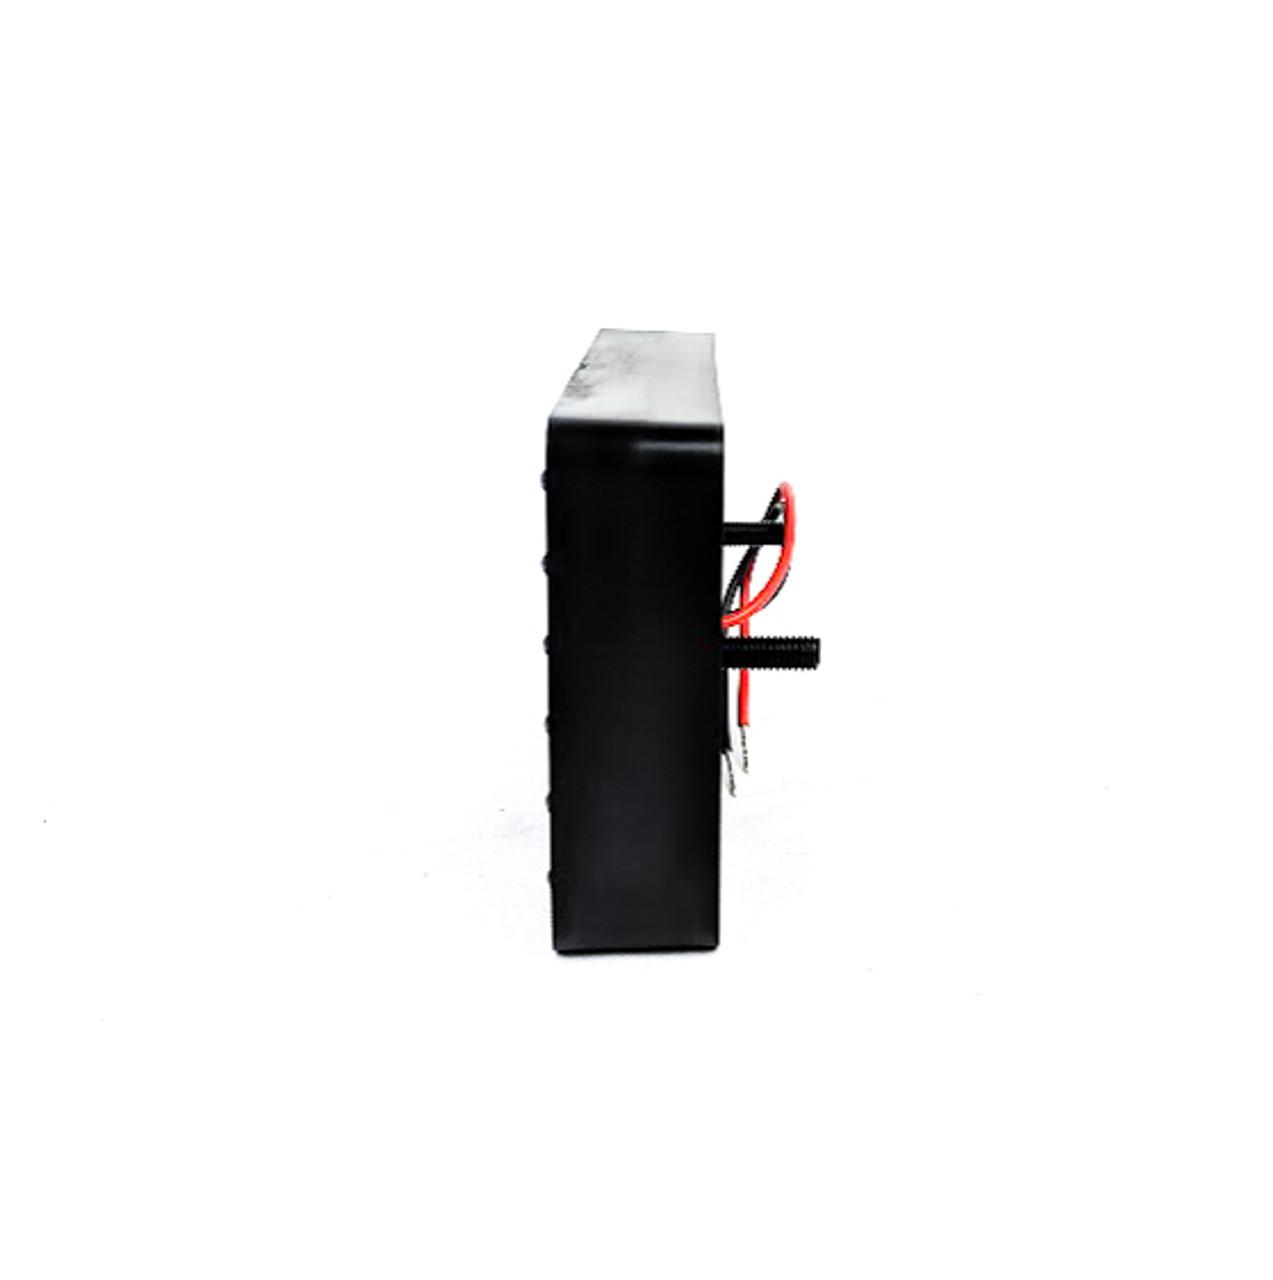 HARD Motorsport LED Red Rain light with Carbon Fiber Trim - Universal